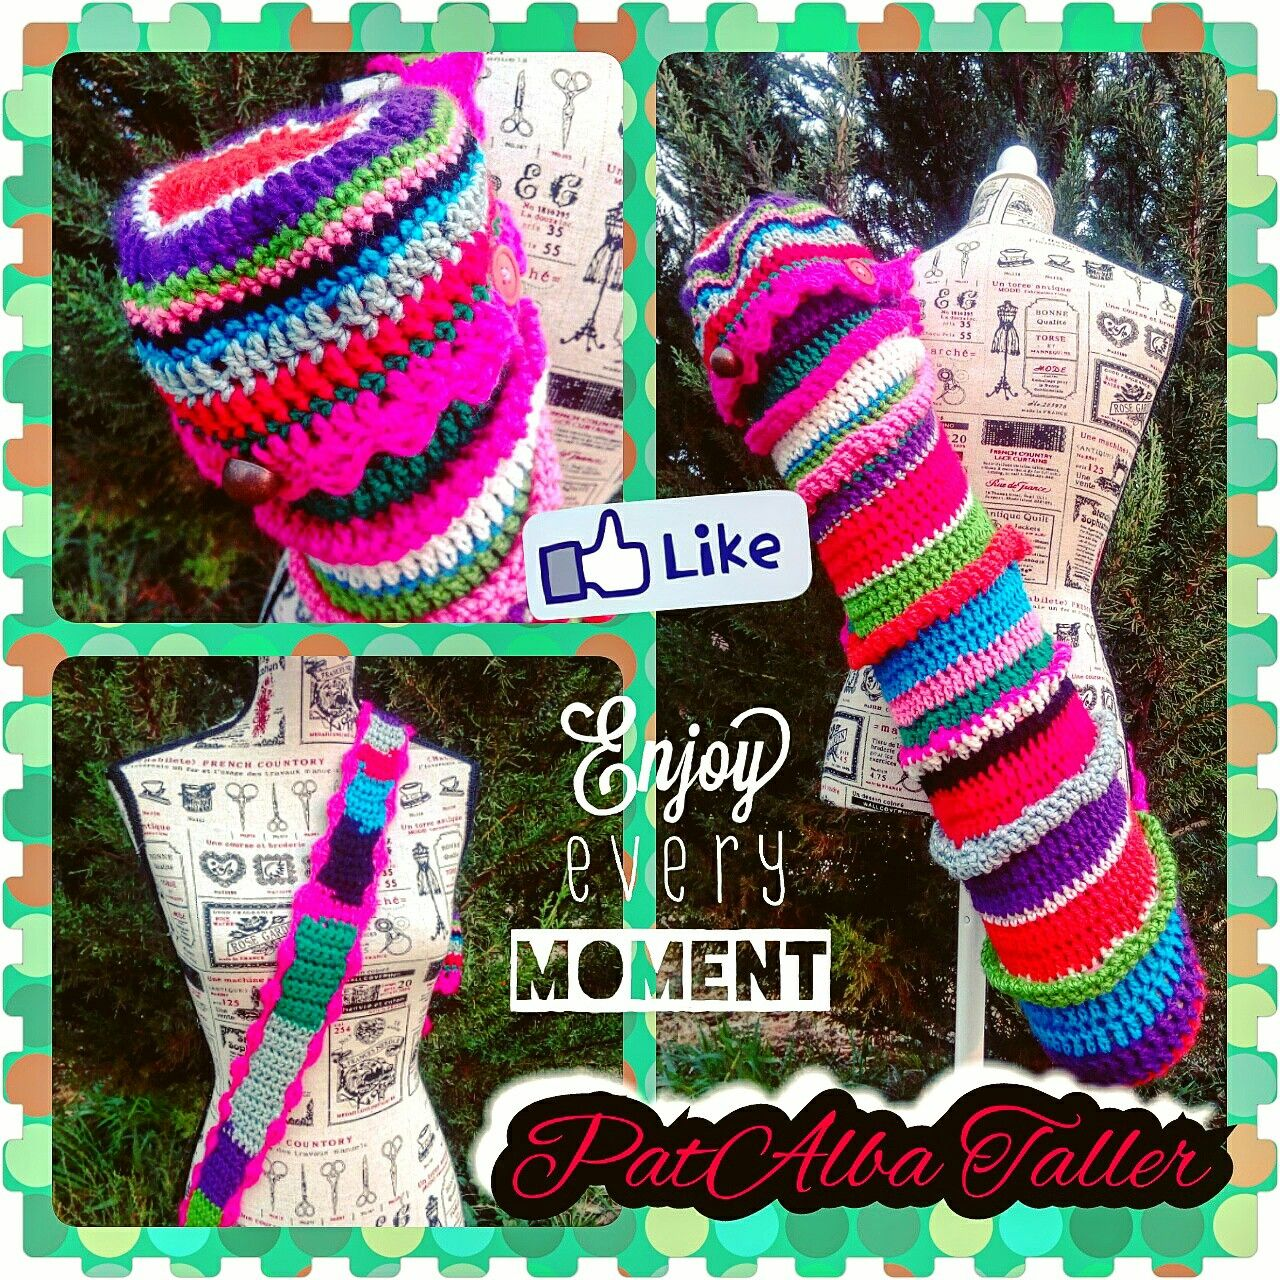 Bolso multicolor para tu MAT tejido ❗.... Encarga el tuyo  #PatAlbaTaller #diseñodeautor #emprendedora #artesana #handmade #tejidos #crochet #confeccionapedido #regalounico